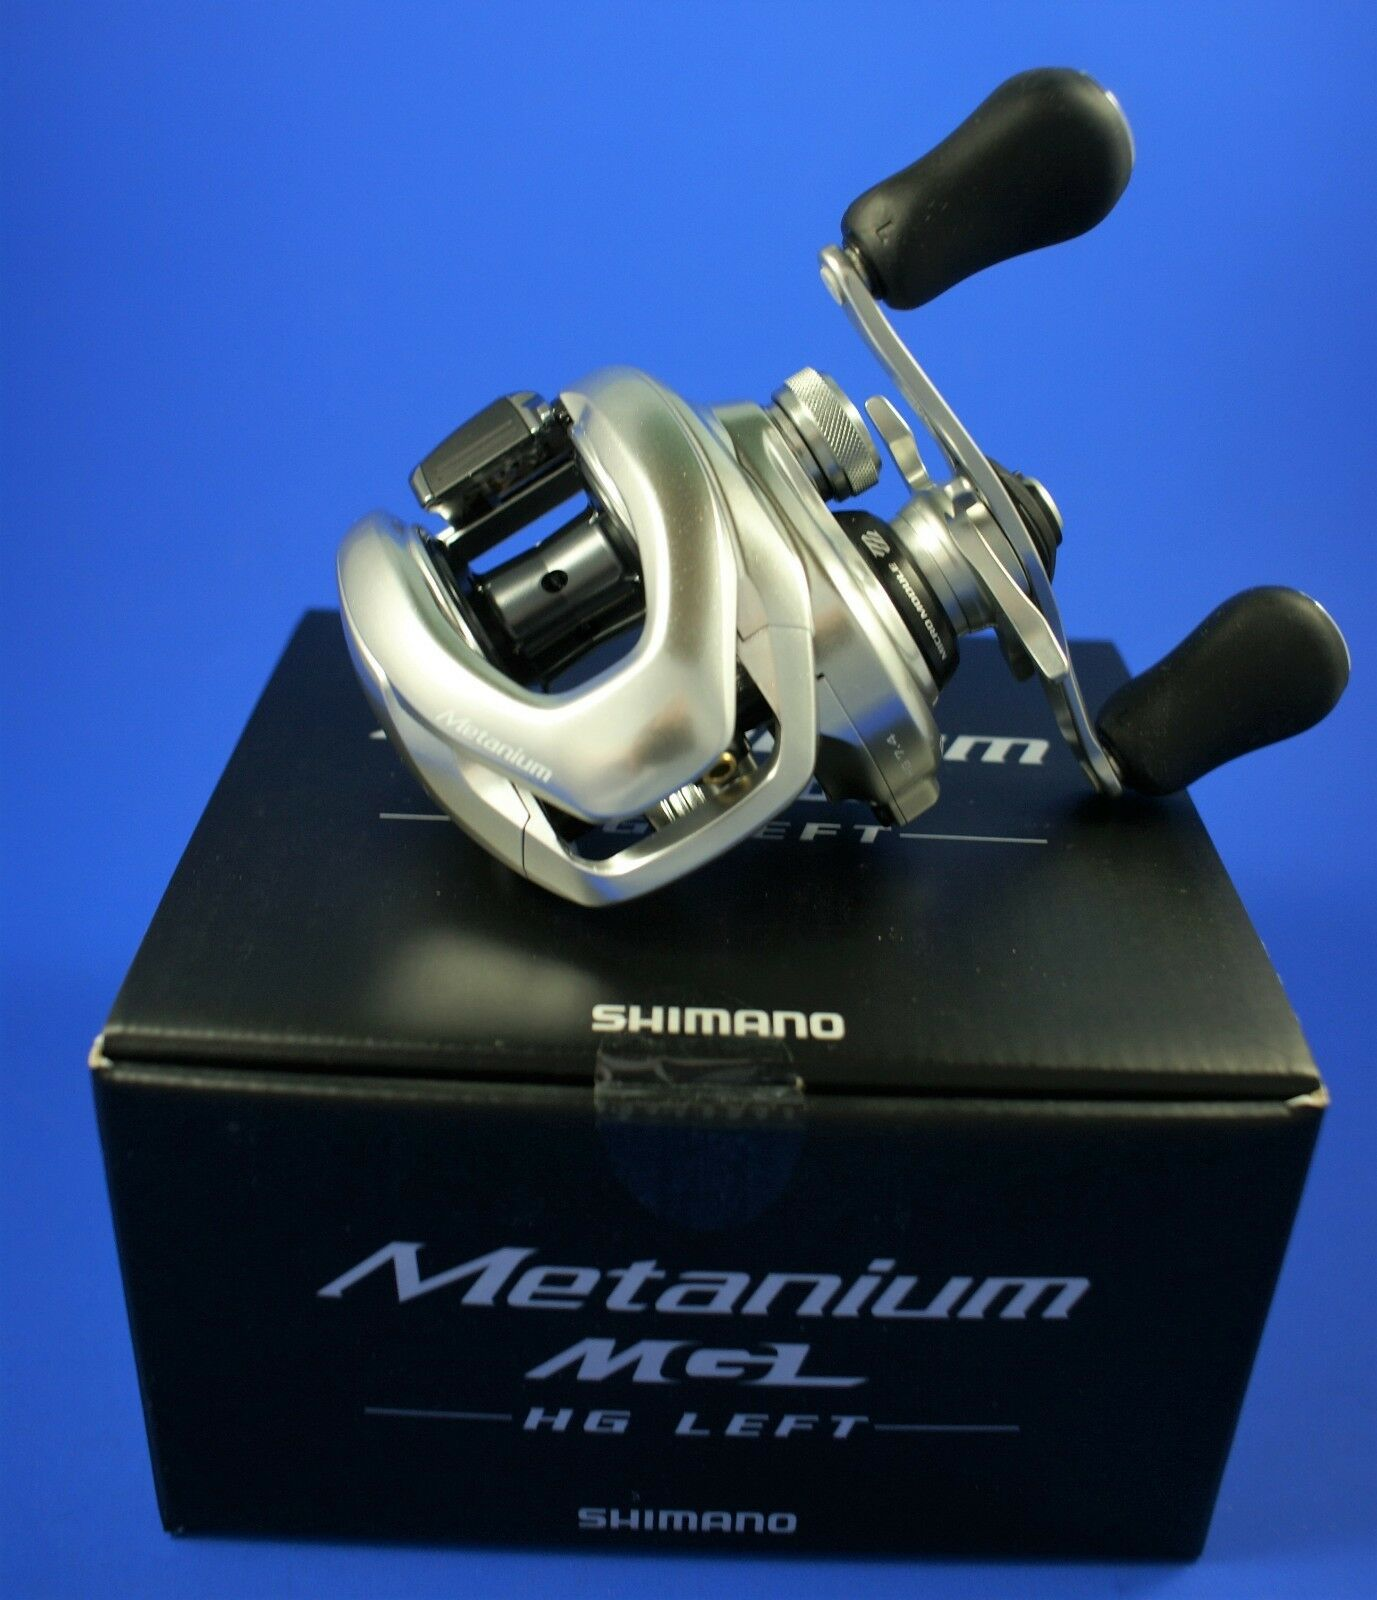 Shimano metanium MGL 151 Hg    metmgl 151 Hg    Baitcasting Reel (MANO IZQUIERDA)